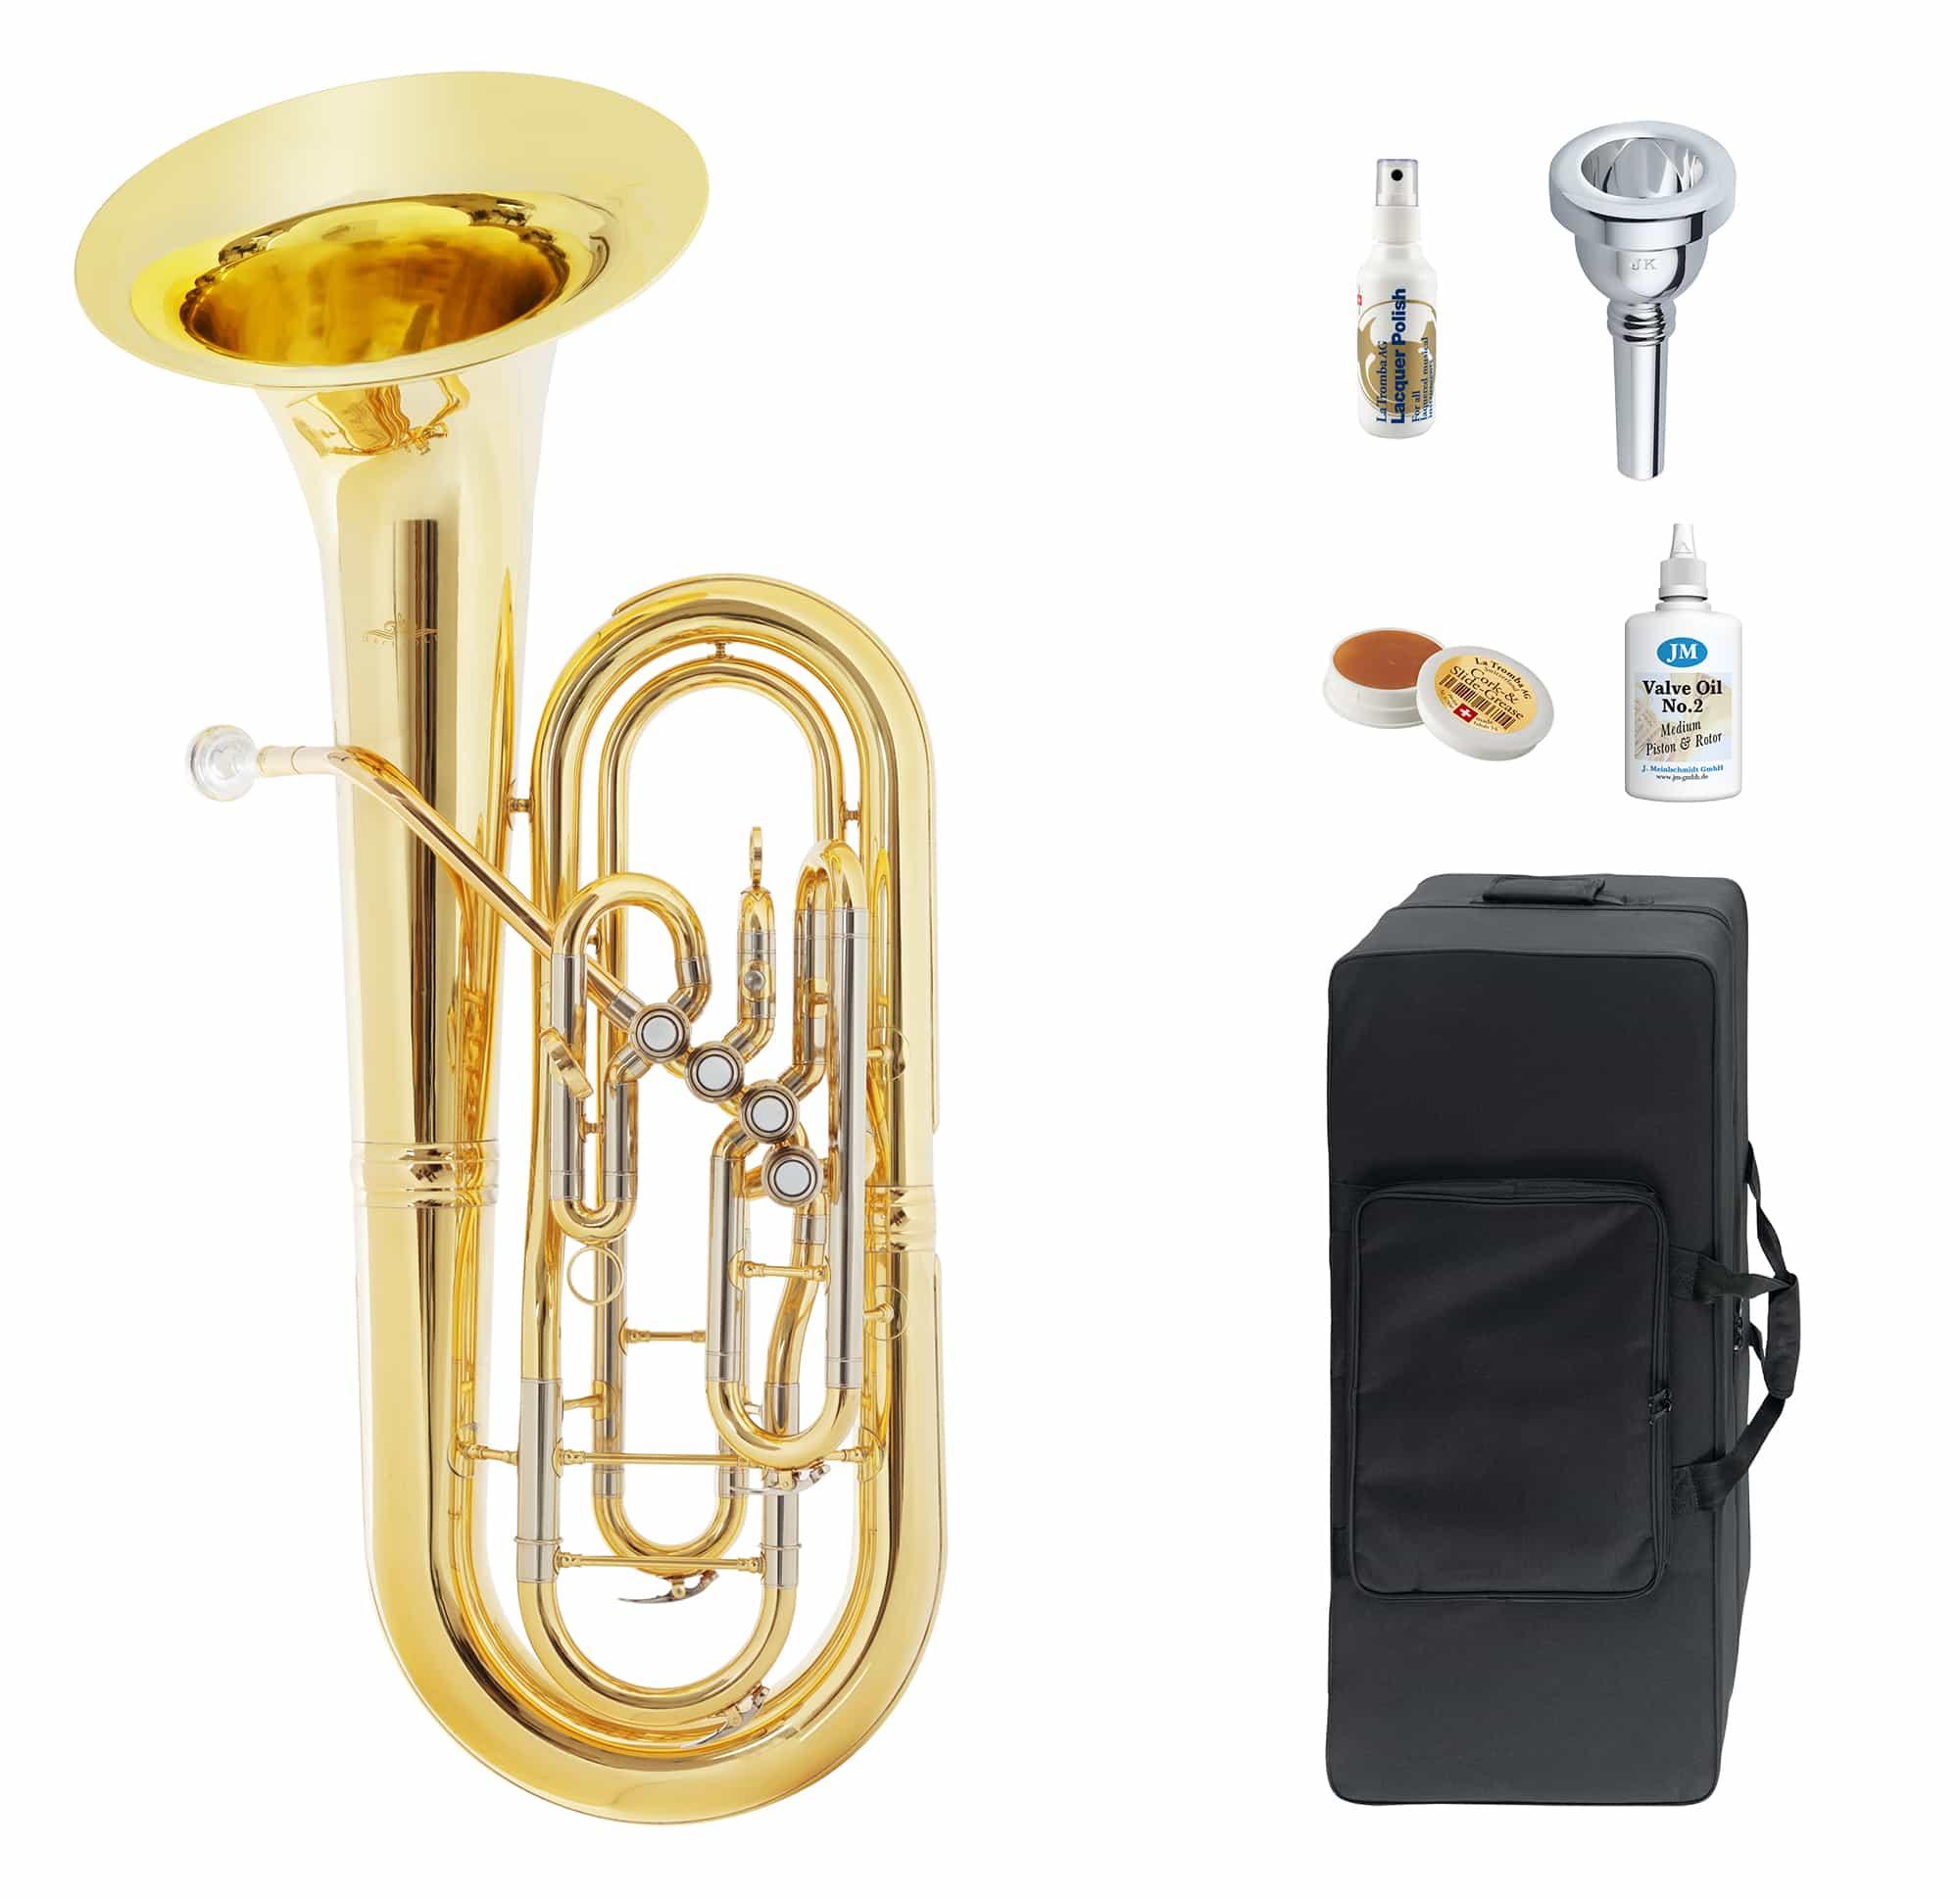 Baritone - Lechgold OB 19|4 Oberkrainer Bariton Deluxe Set - Onlineshop Musikhaus Kirstein